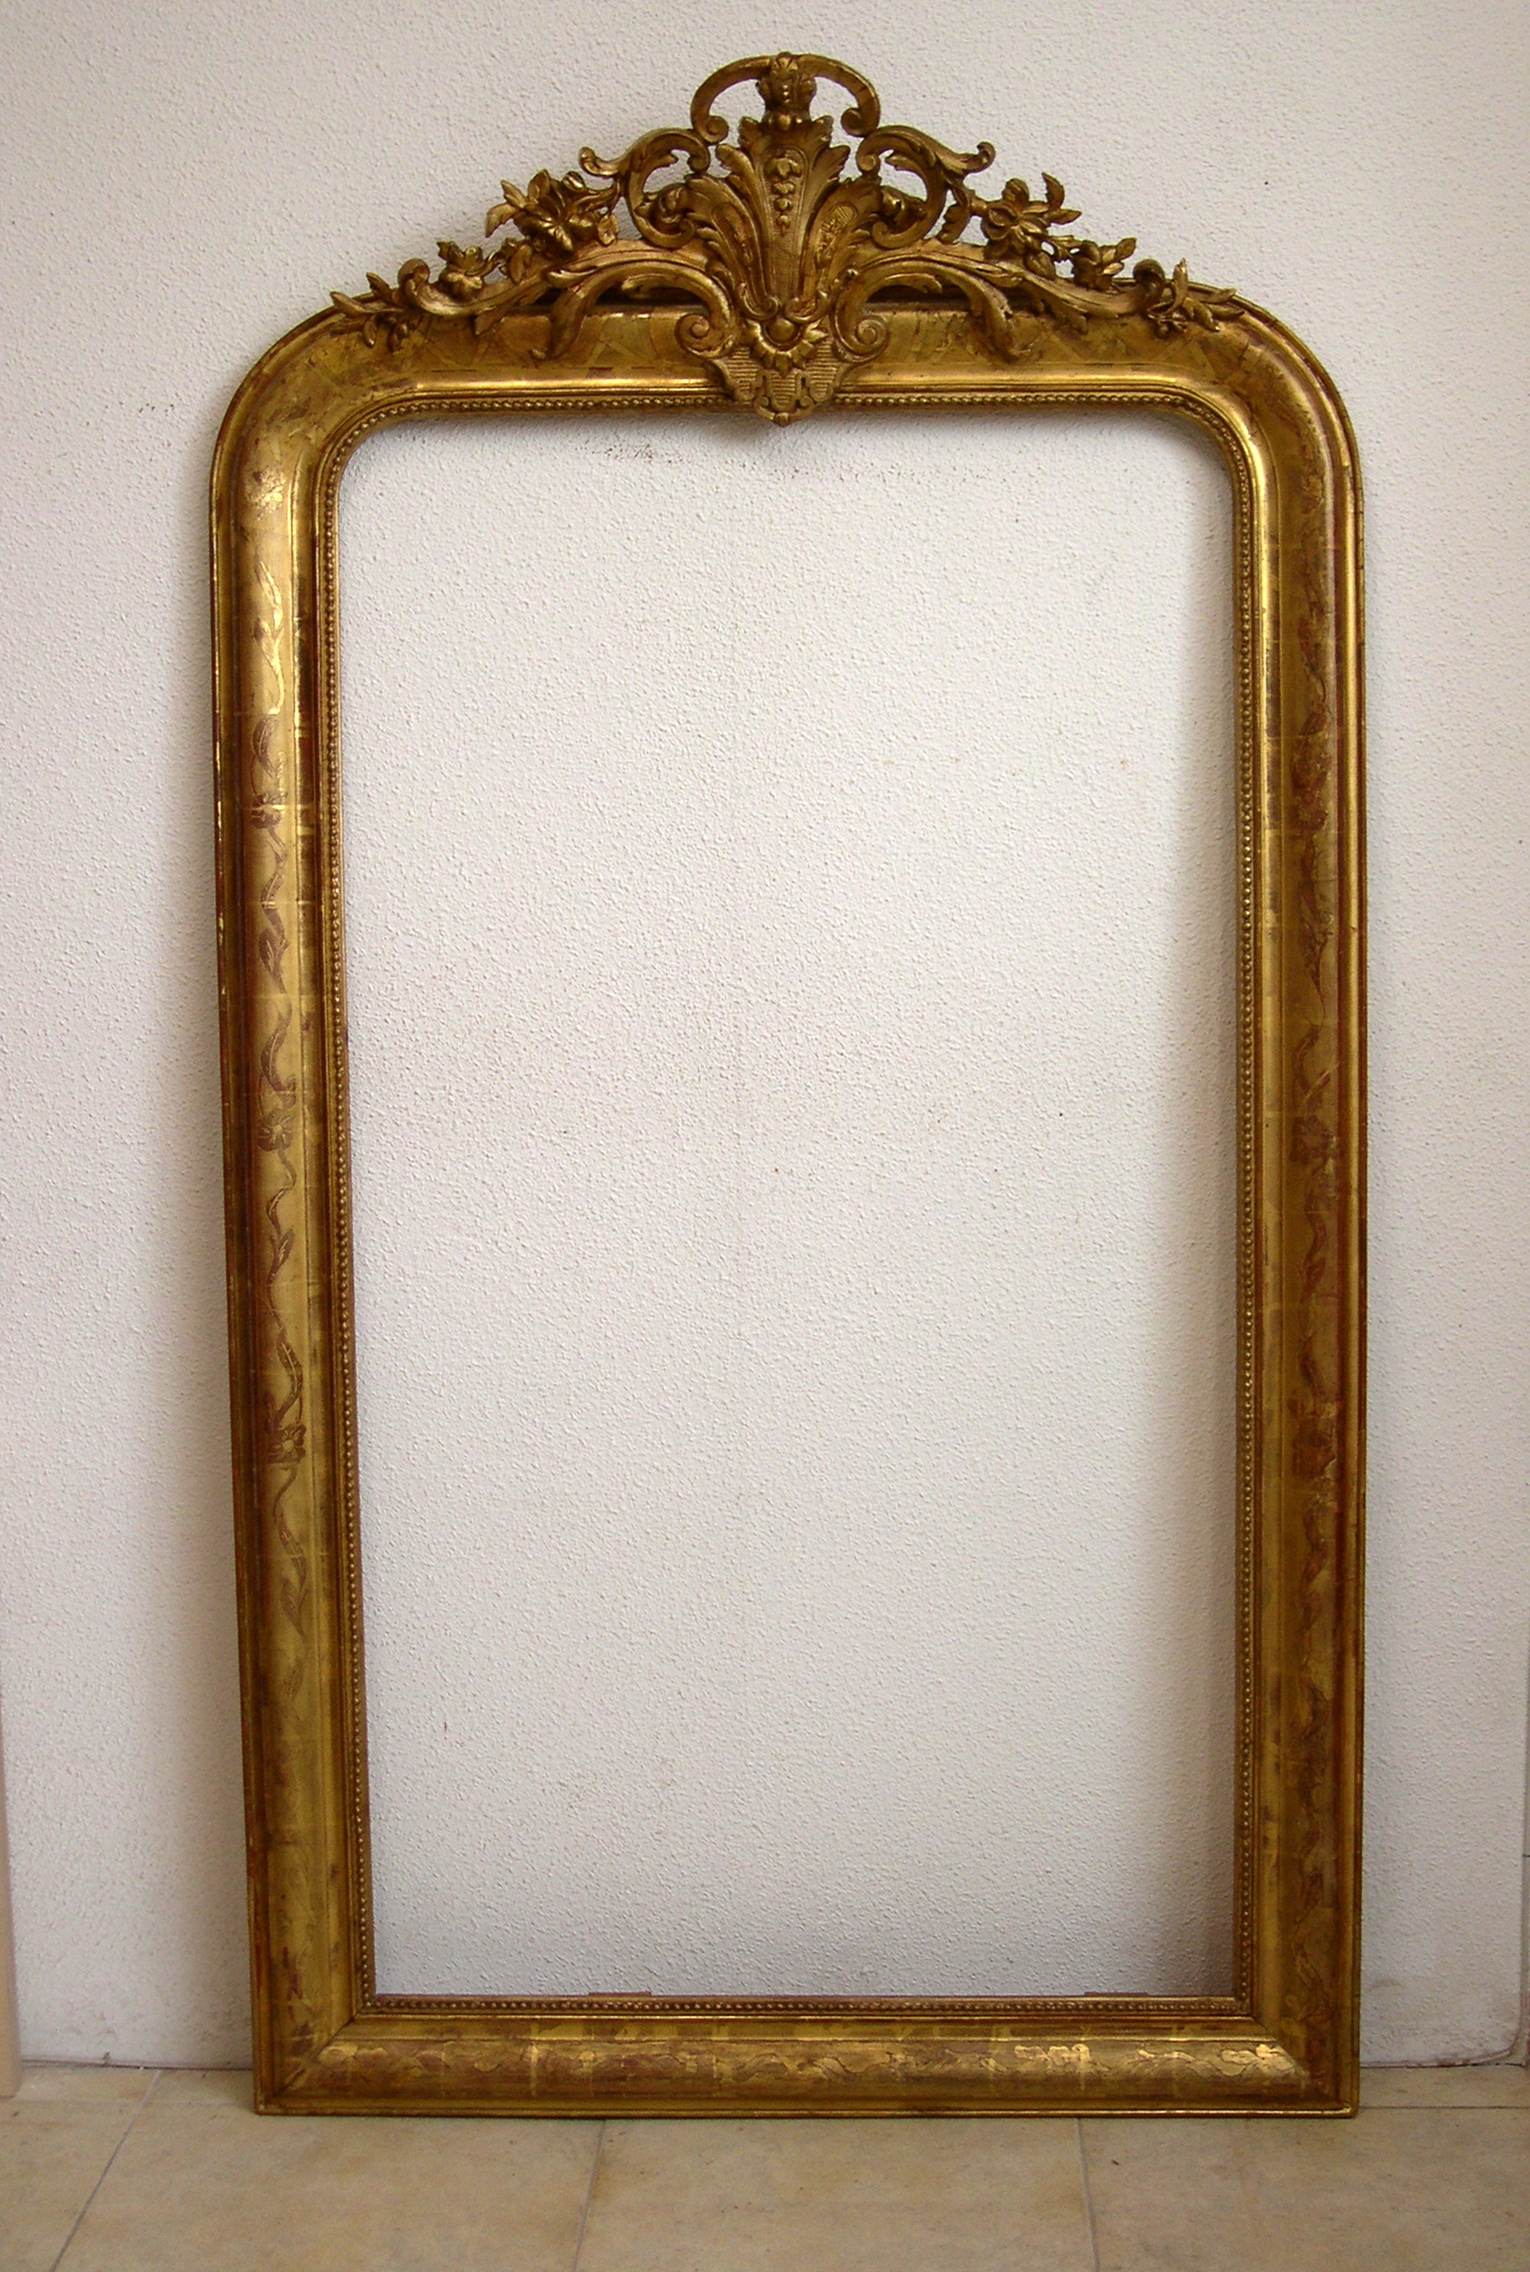 Marco dorado de espejo tras la intervenci 1530 2272 for Espejo marco dorado